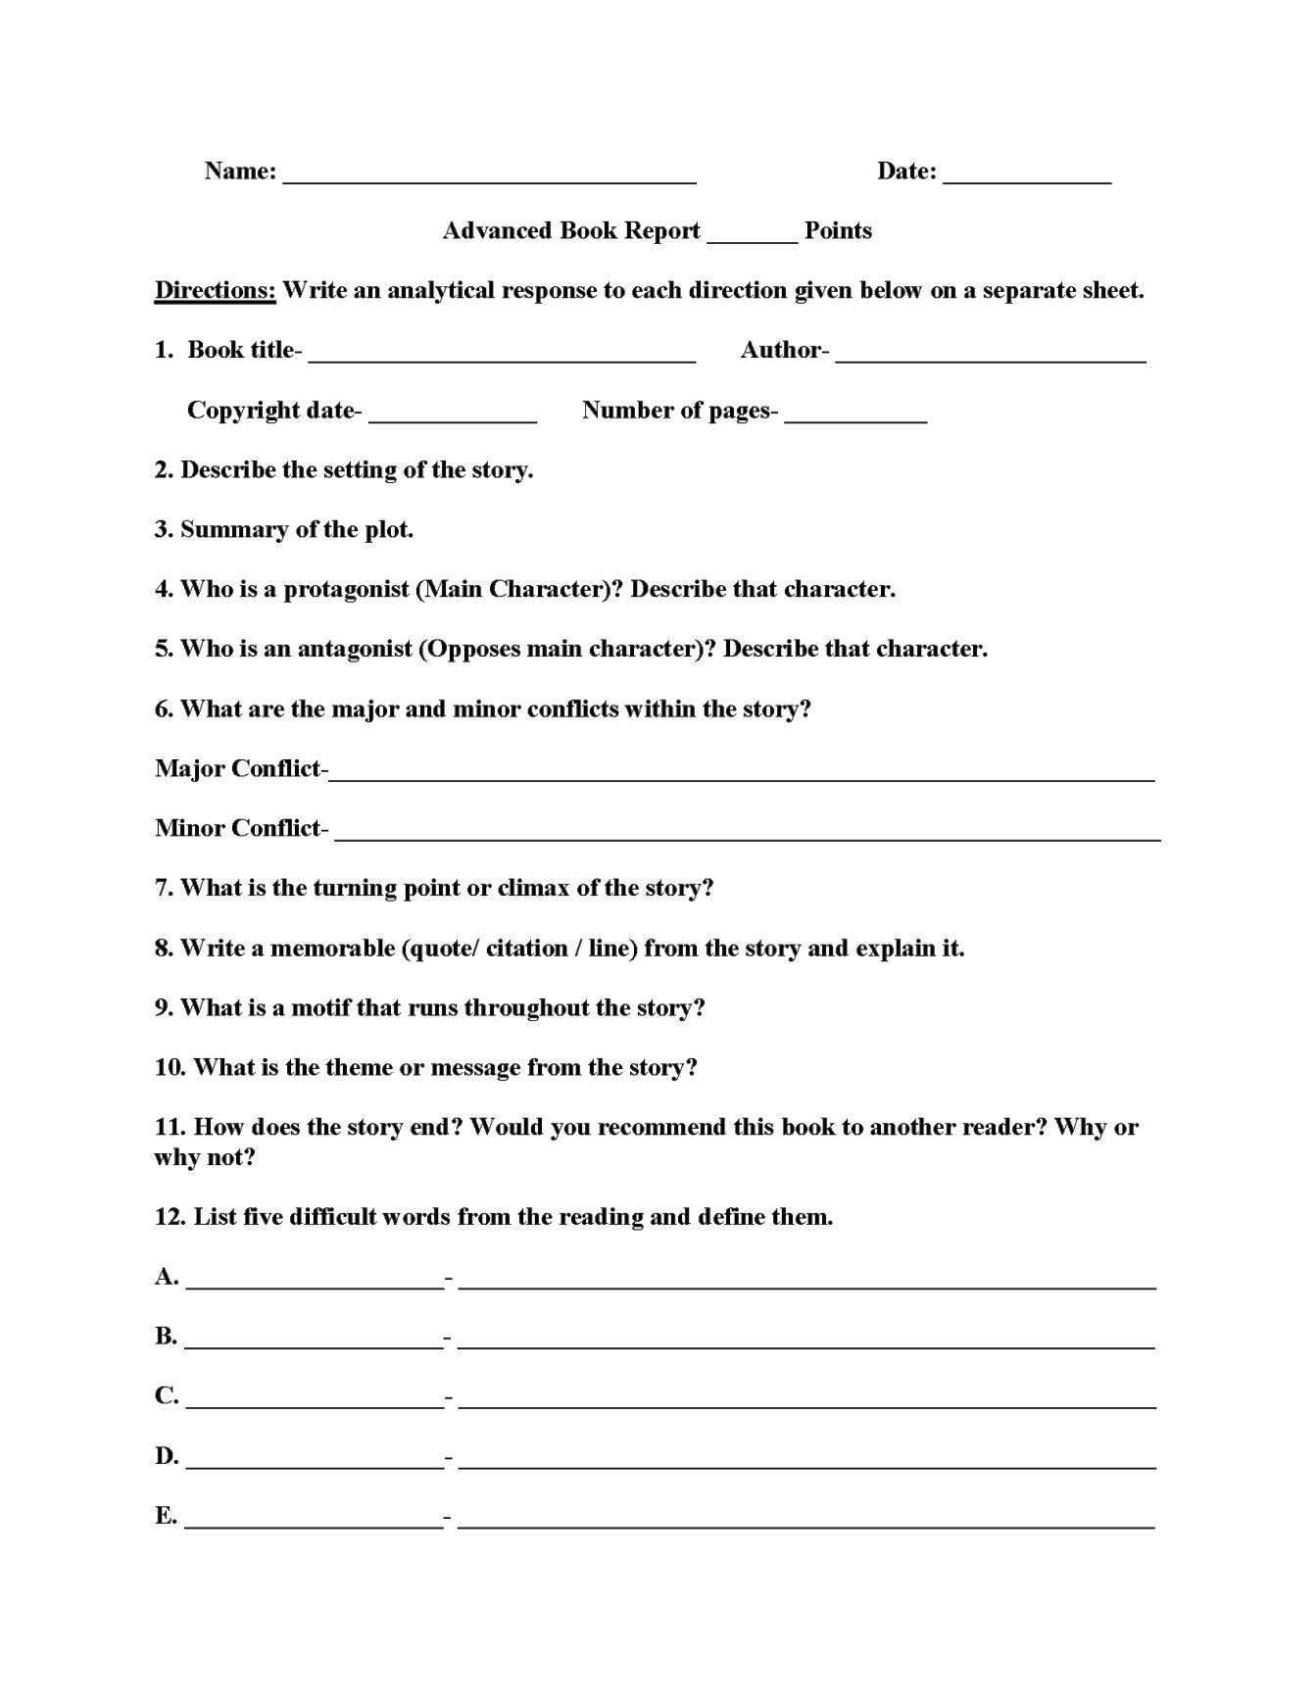 Worksheet 4Th Grade Report | Printable Worksheets And Inside Book Report Template 4Th Grade